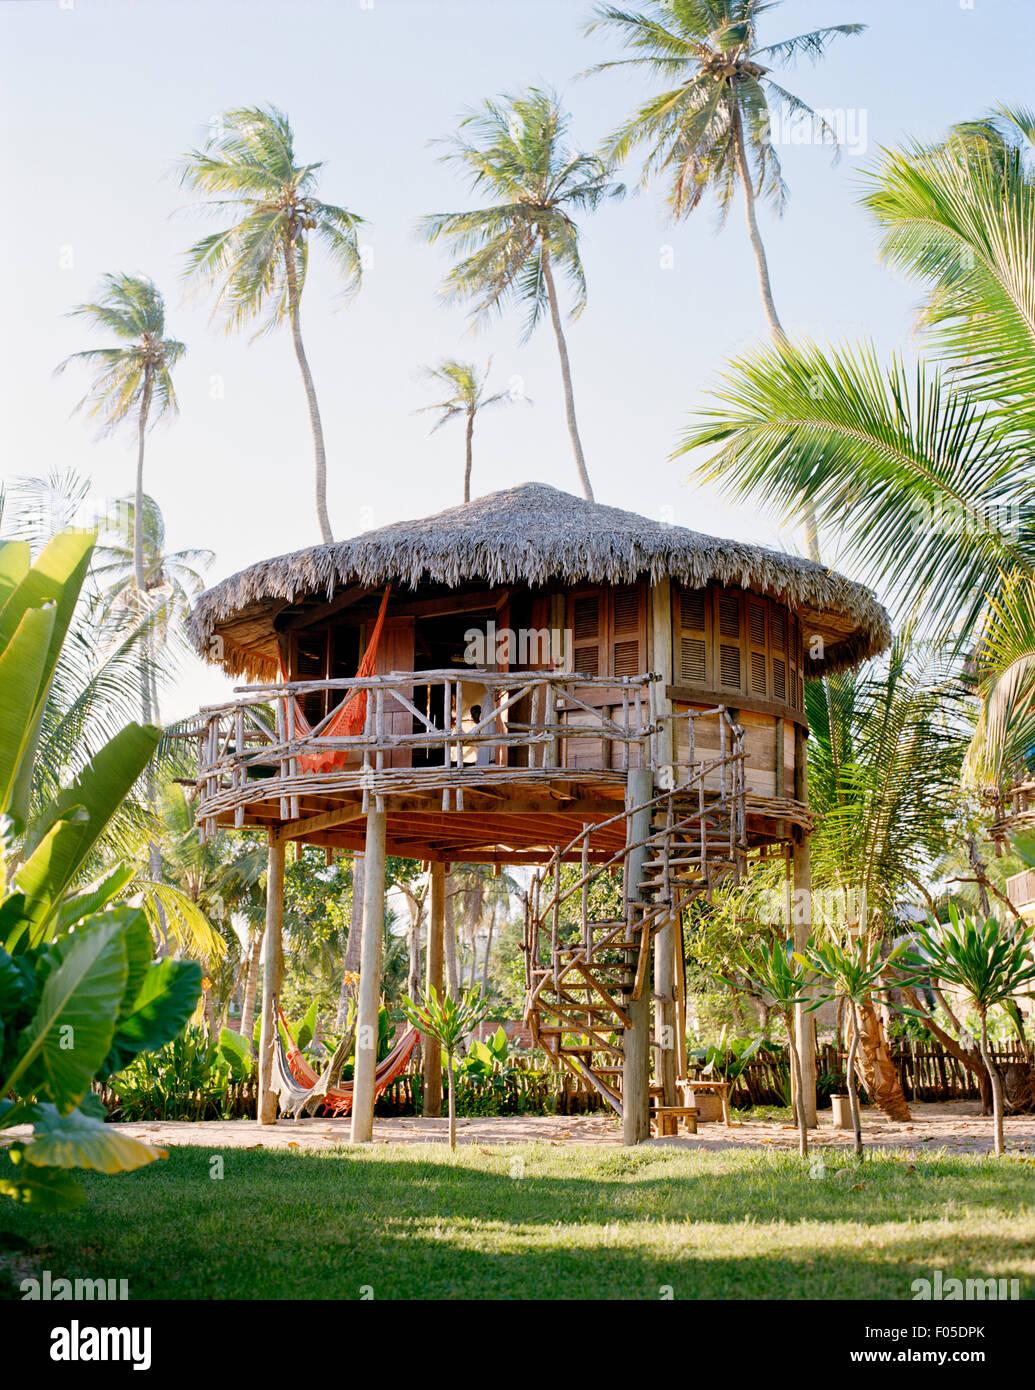 Exterieur der Villa # 18 im Hotel Vila Kalango. Jericoacoara, Ceara, Brasilien. Südamerika Stockbild